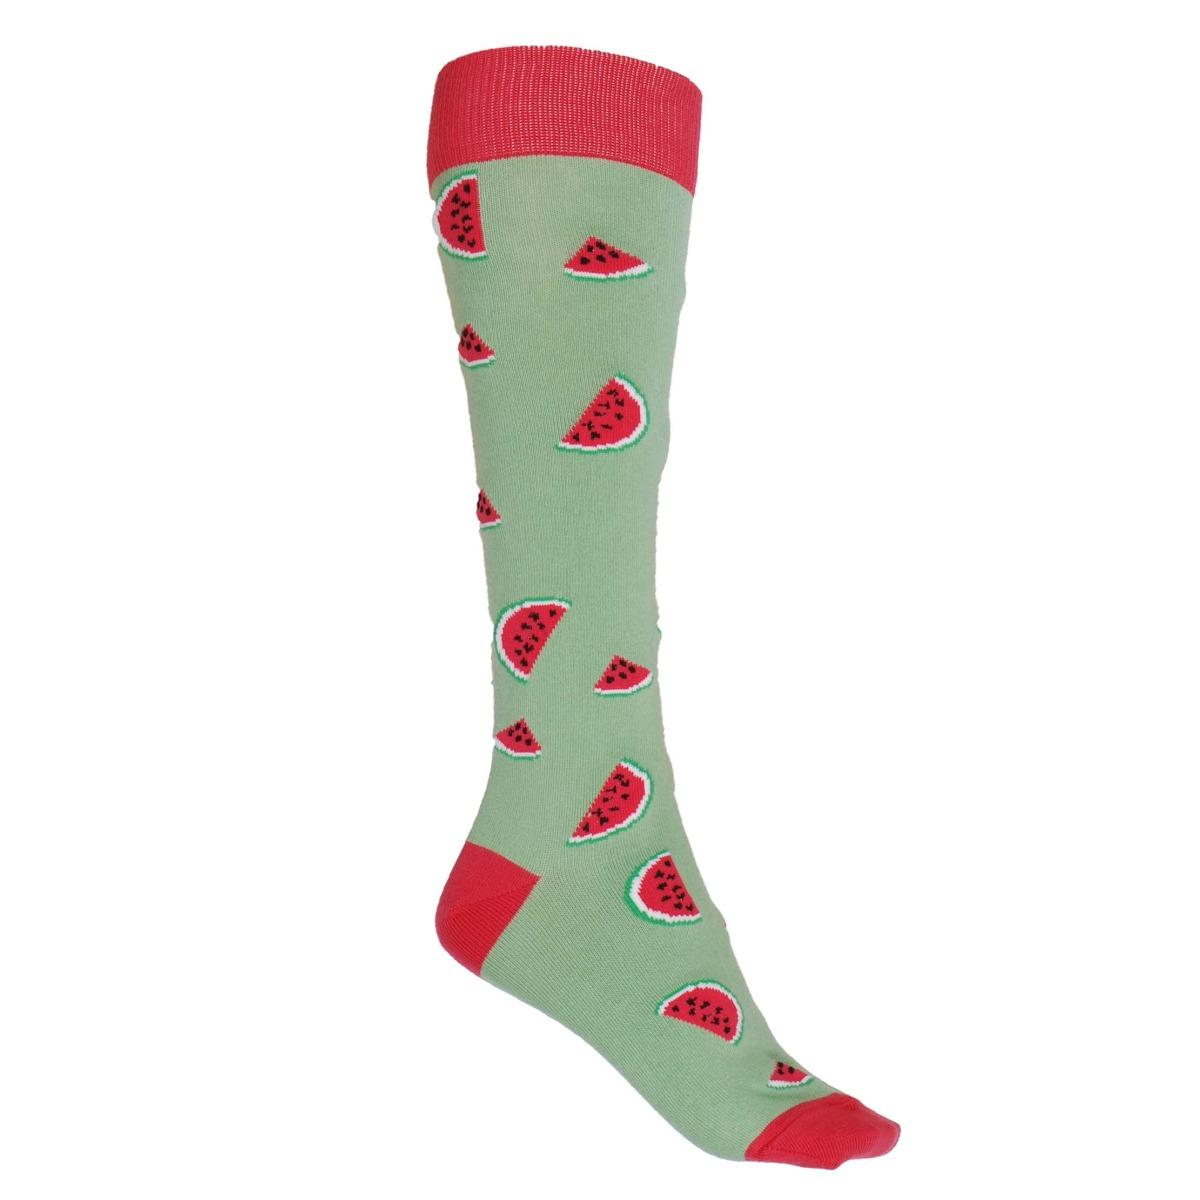 Mondoni Watermeloen kniekousen lichtgroen maat:39-42